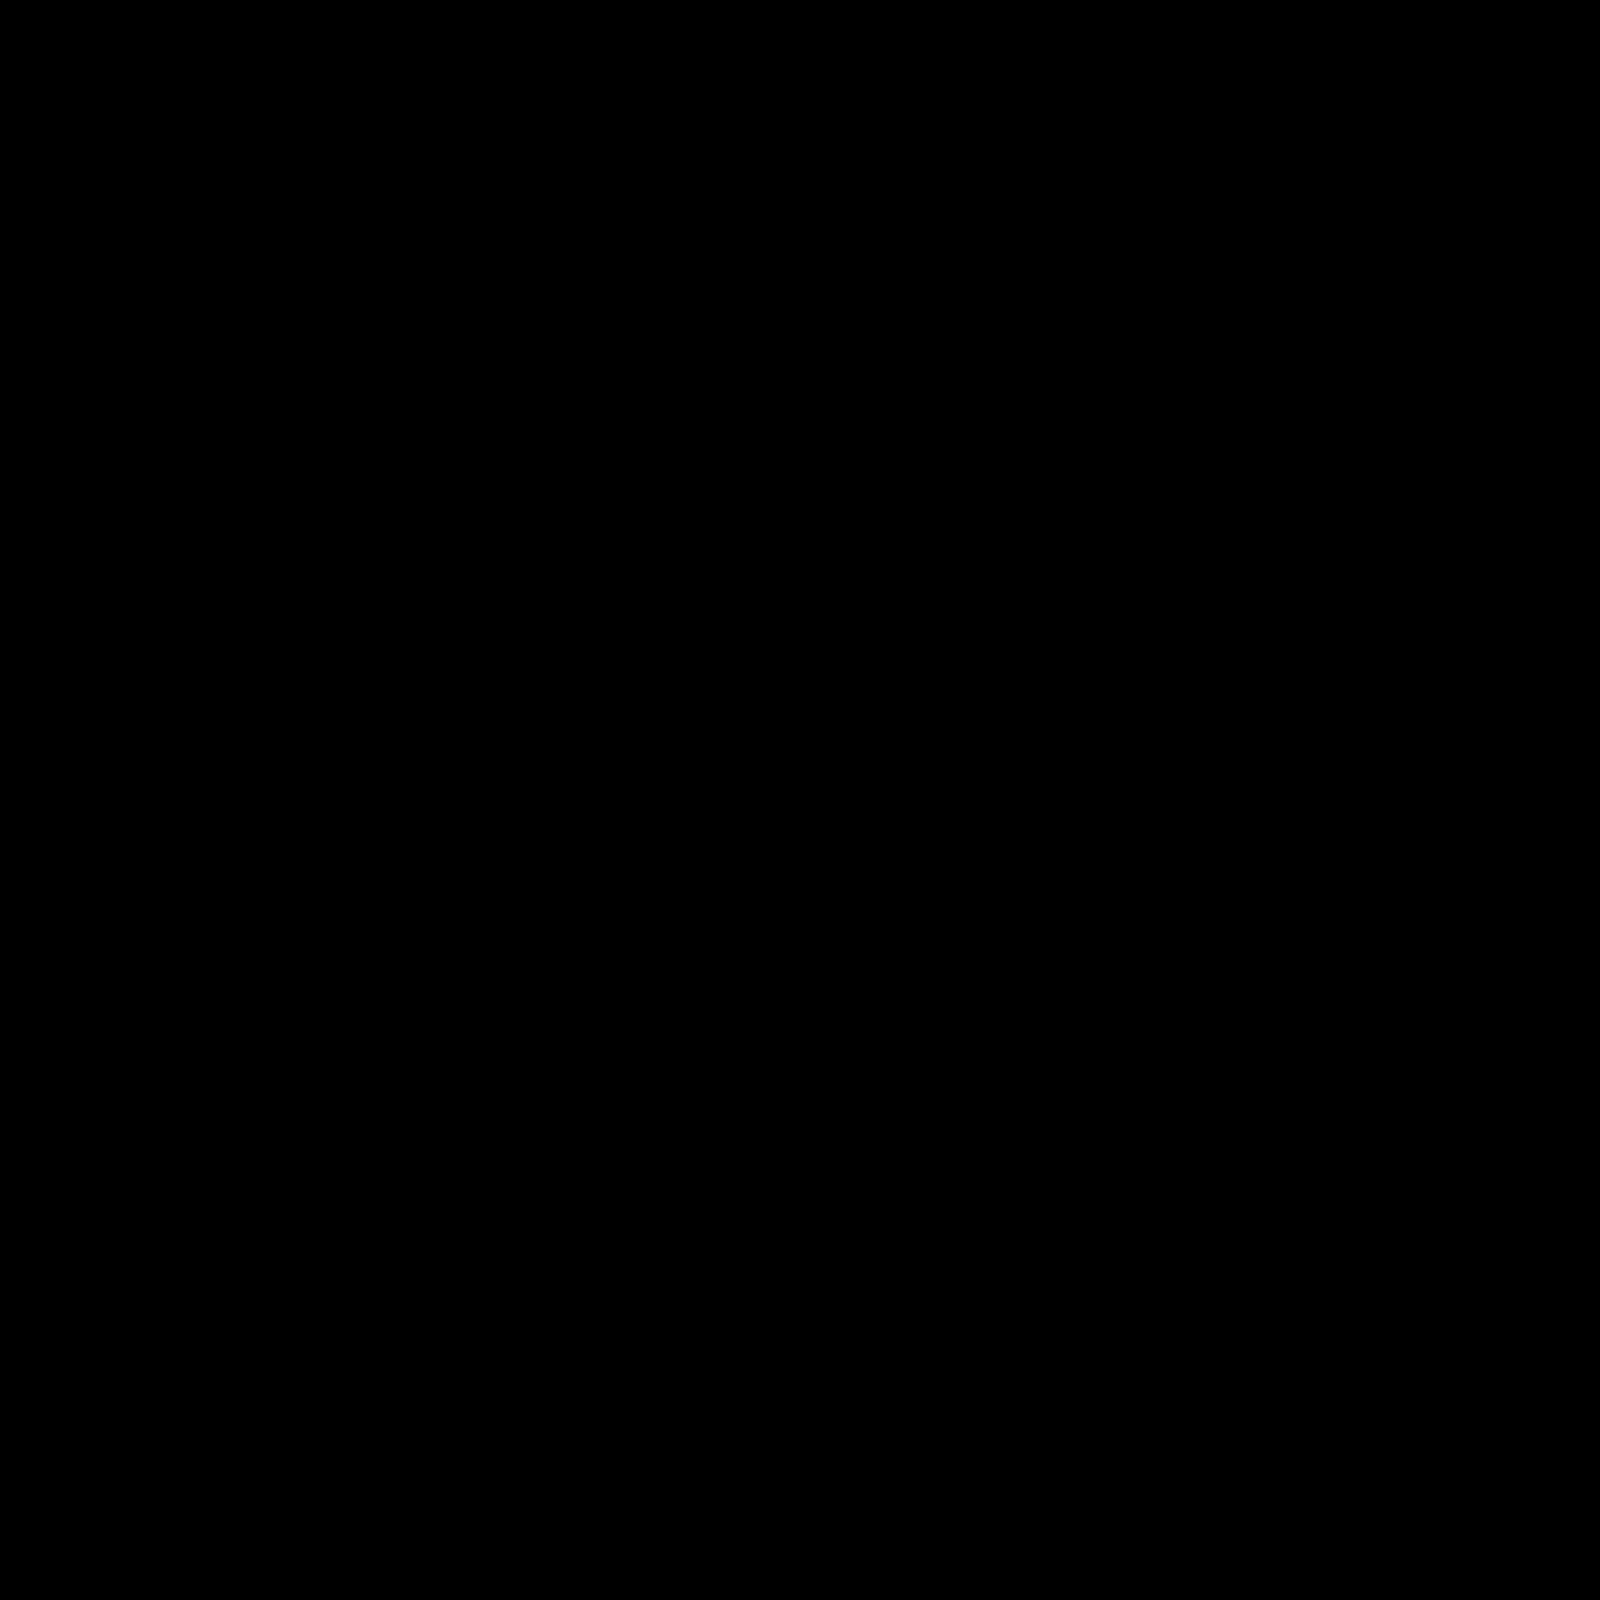 1600x1600 Joystick Clipart Remote